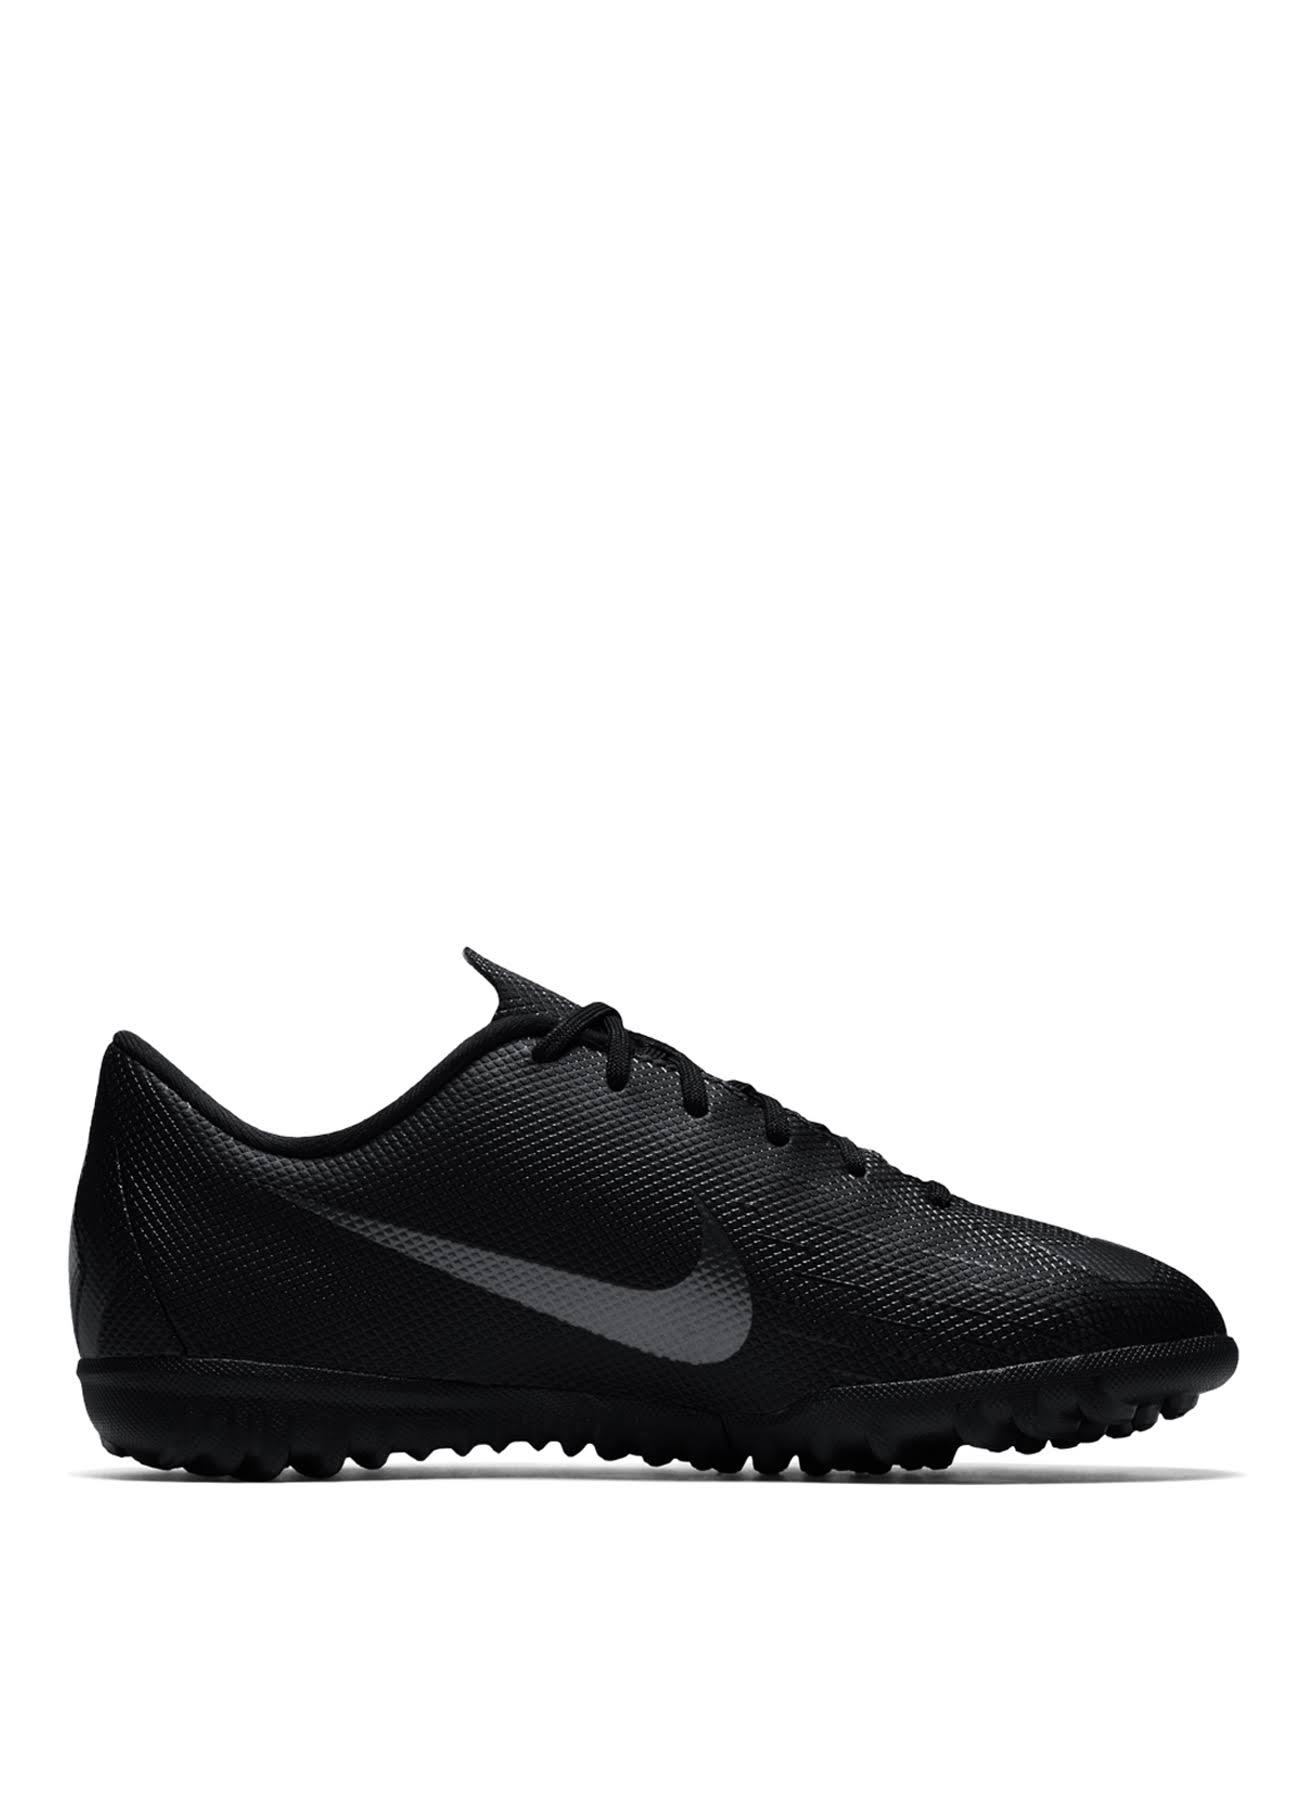 Academy Nike Siyah Vapor Ayakkabı Jr Saha Mercurialx Halı Tf Xii Çocuk wIqAZCT